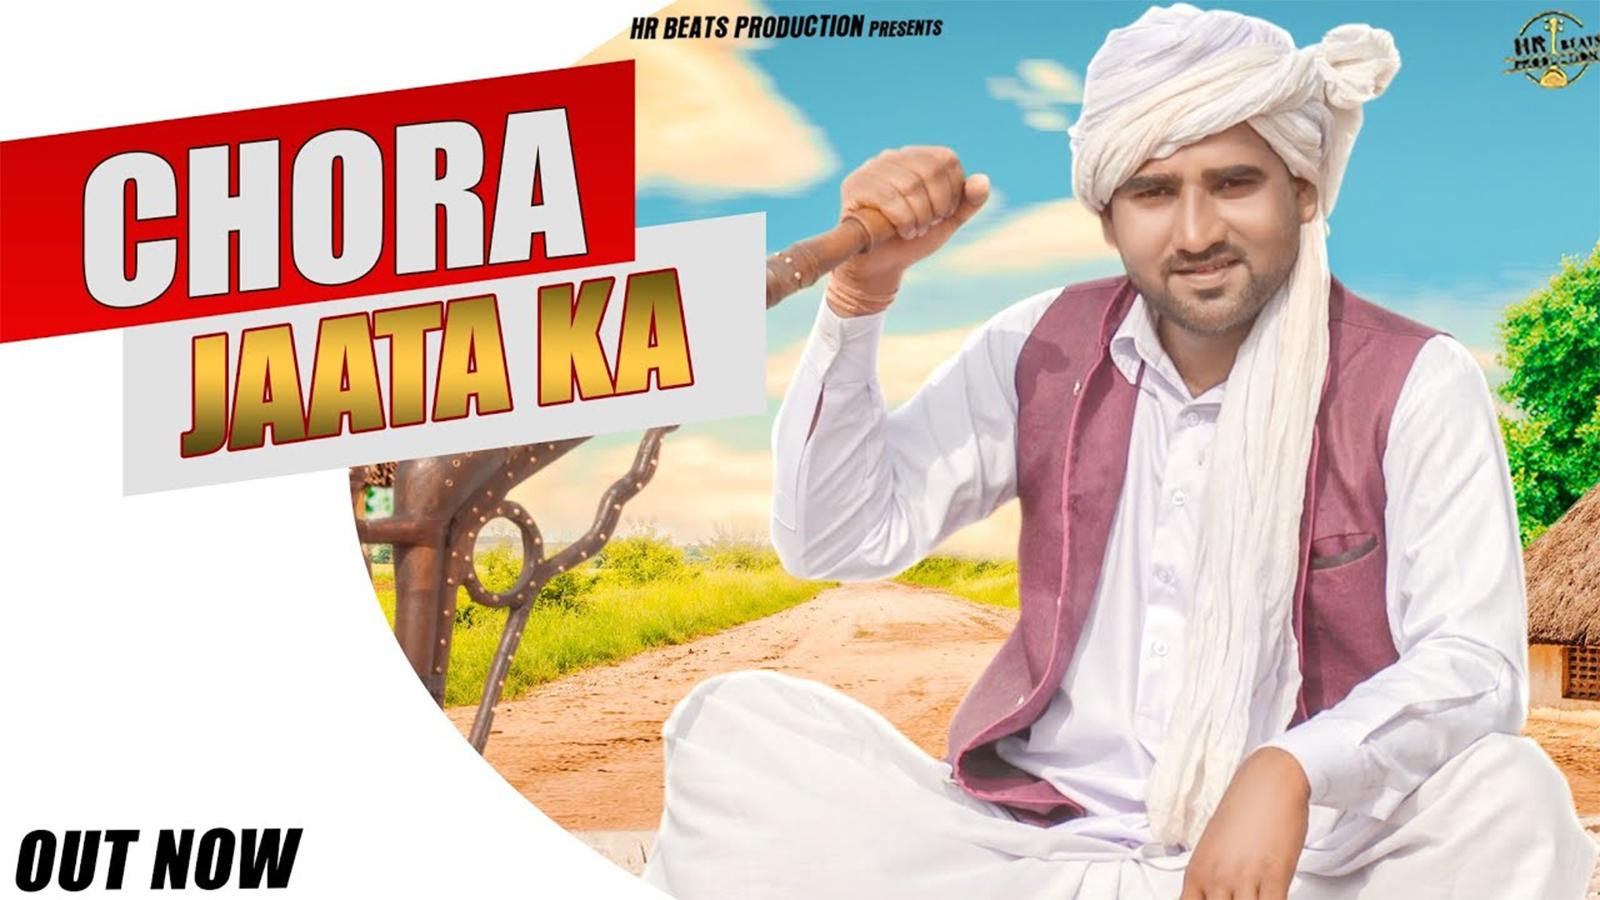 Latest Haryanvi Song Chora Jaata Ka Sung By Pawan Pilania